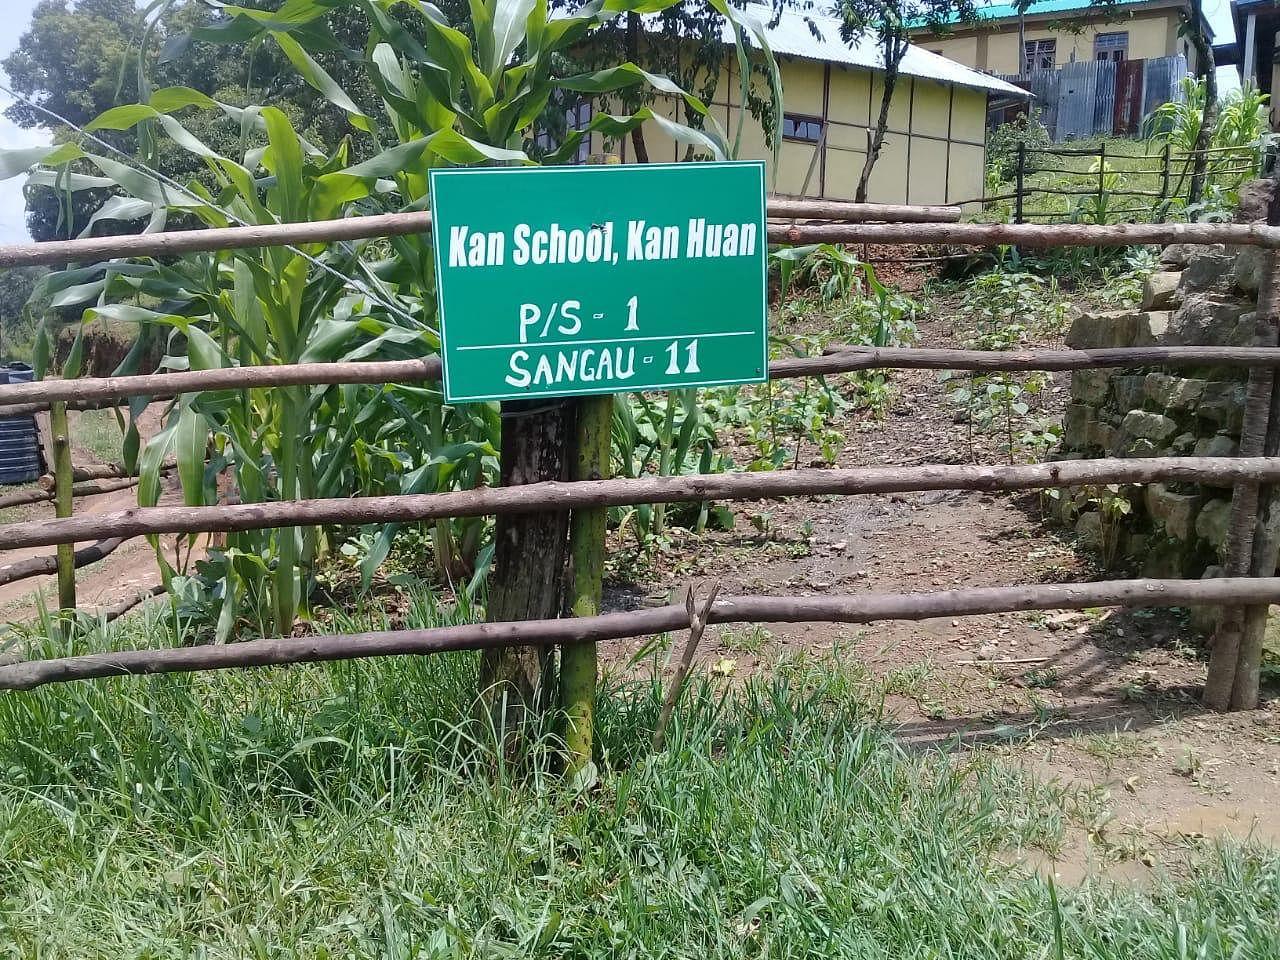 Kan Sikul, Kan Huan! In Mizo, this means 'My School, My Farm.'